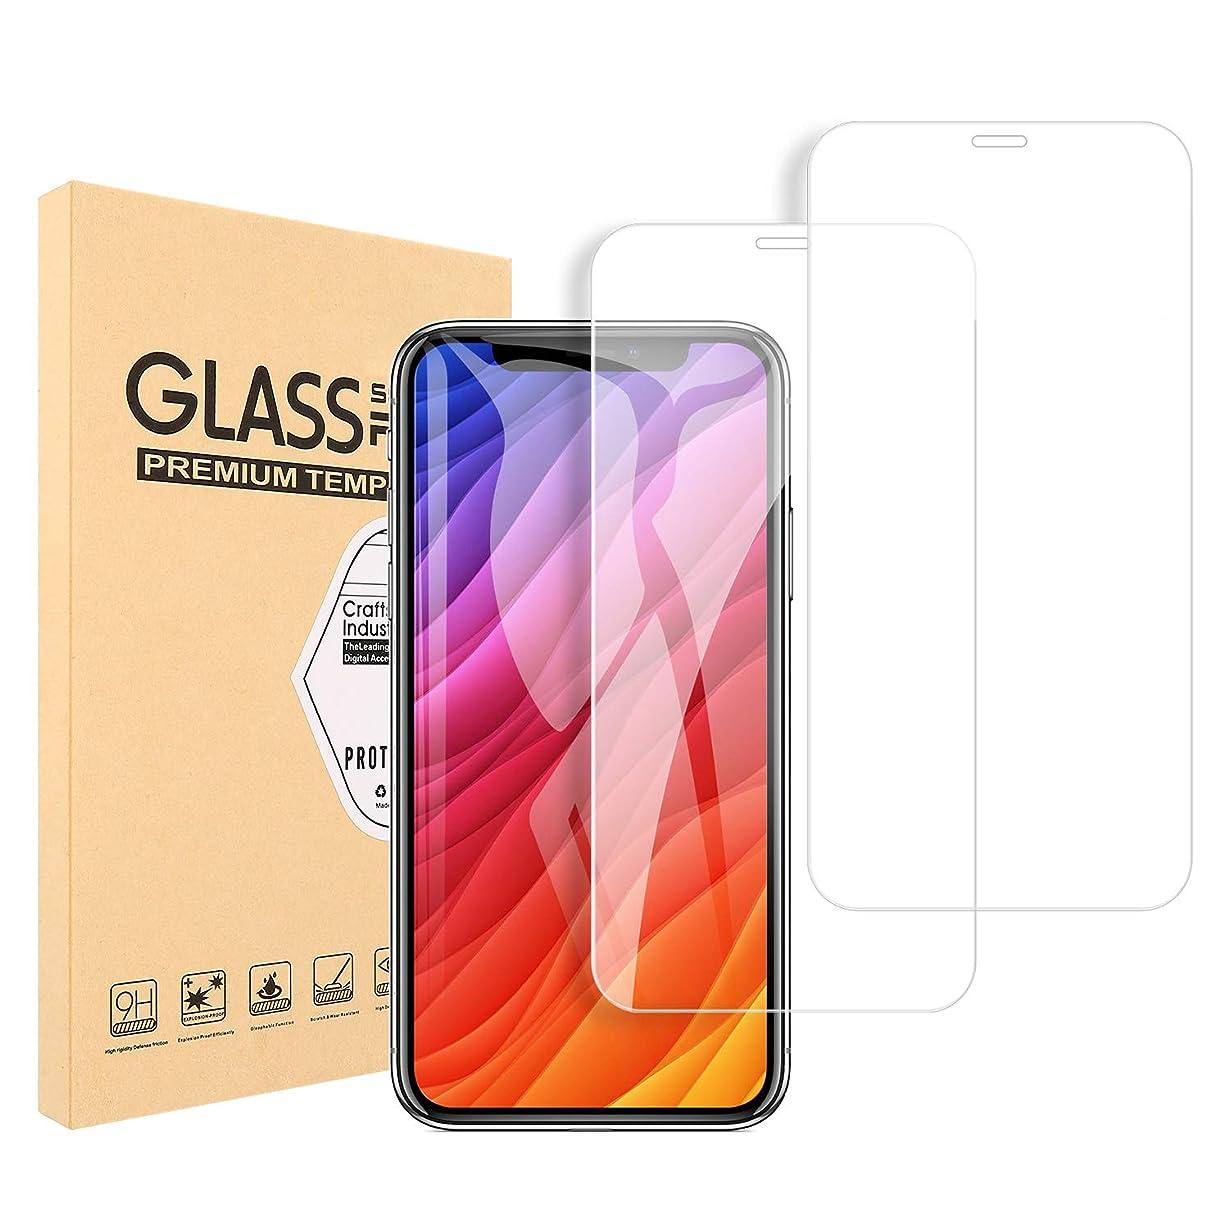 iPhone XS ガラスフイルム iPhone X 強化ガラス 業界最高硬度9H/99%透過率/3D Touch対応/自動吸着/気泡ゼロ アイフォン XS/X 液晶保護フイルム 5.8インチ(2枚セット 透明)